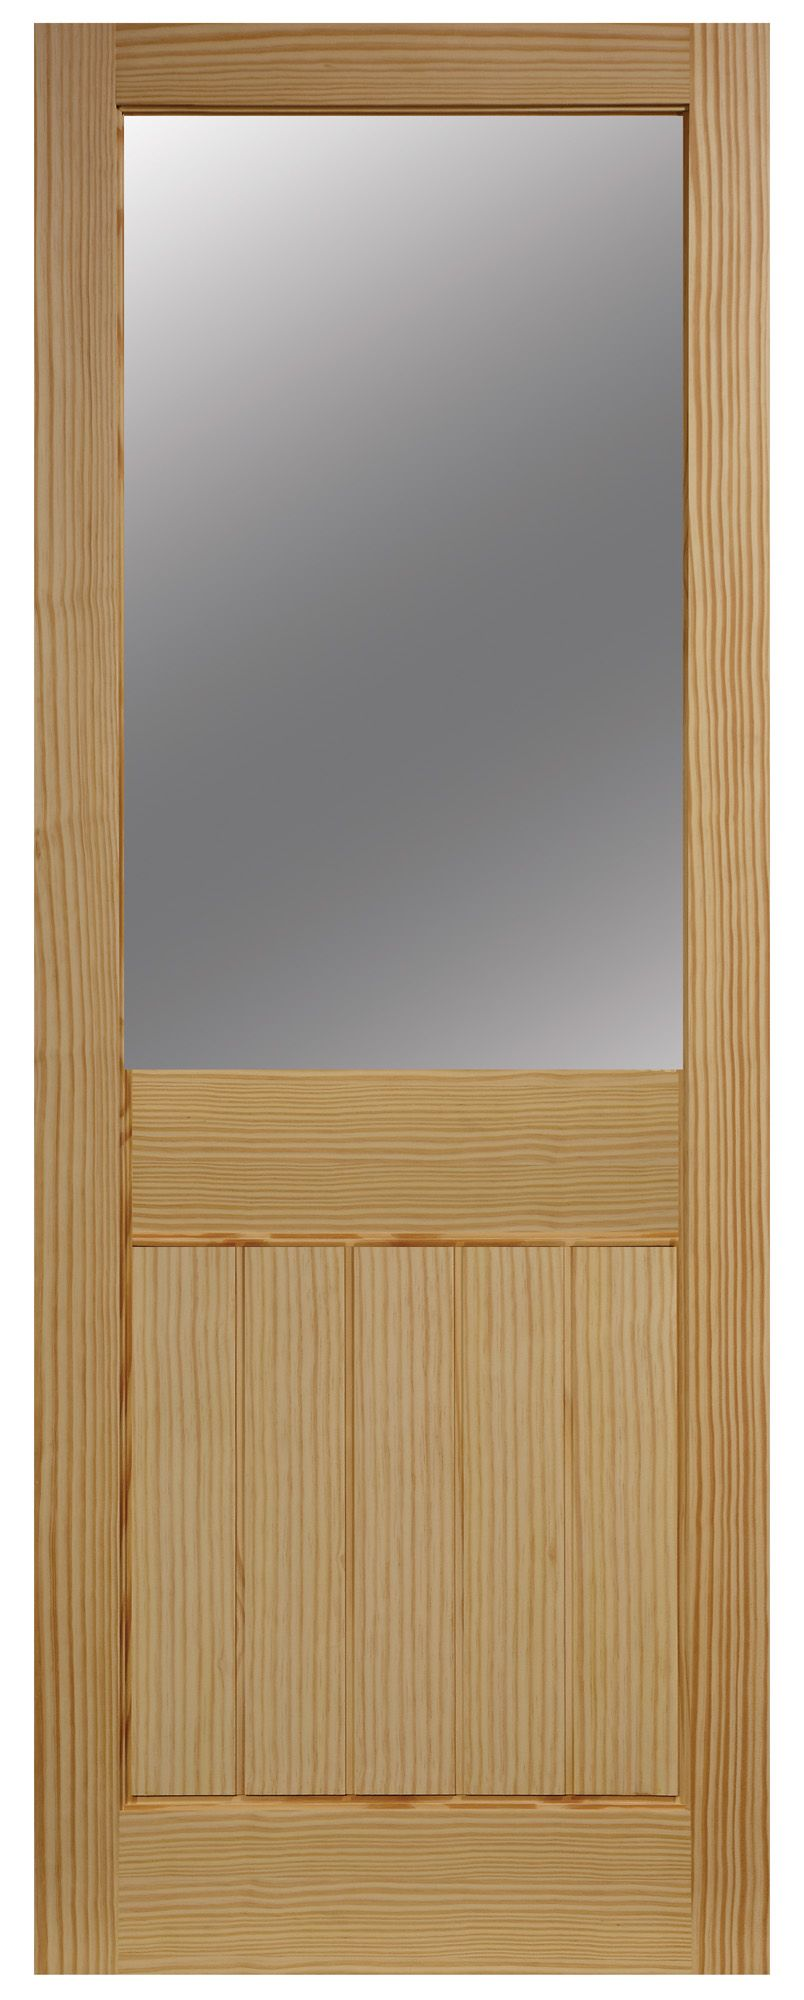 Cottage 2 Panel Clear Pine Glazed Internal Standard Door, (h)1981mm (w)686mm